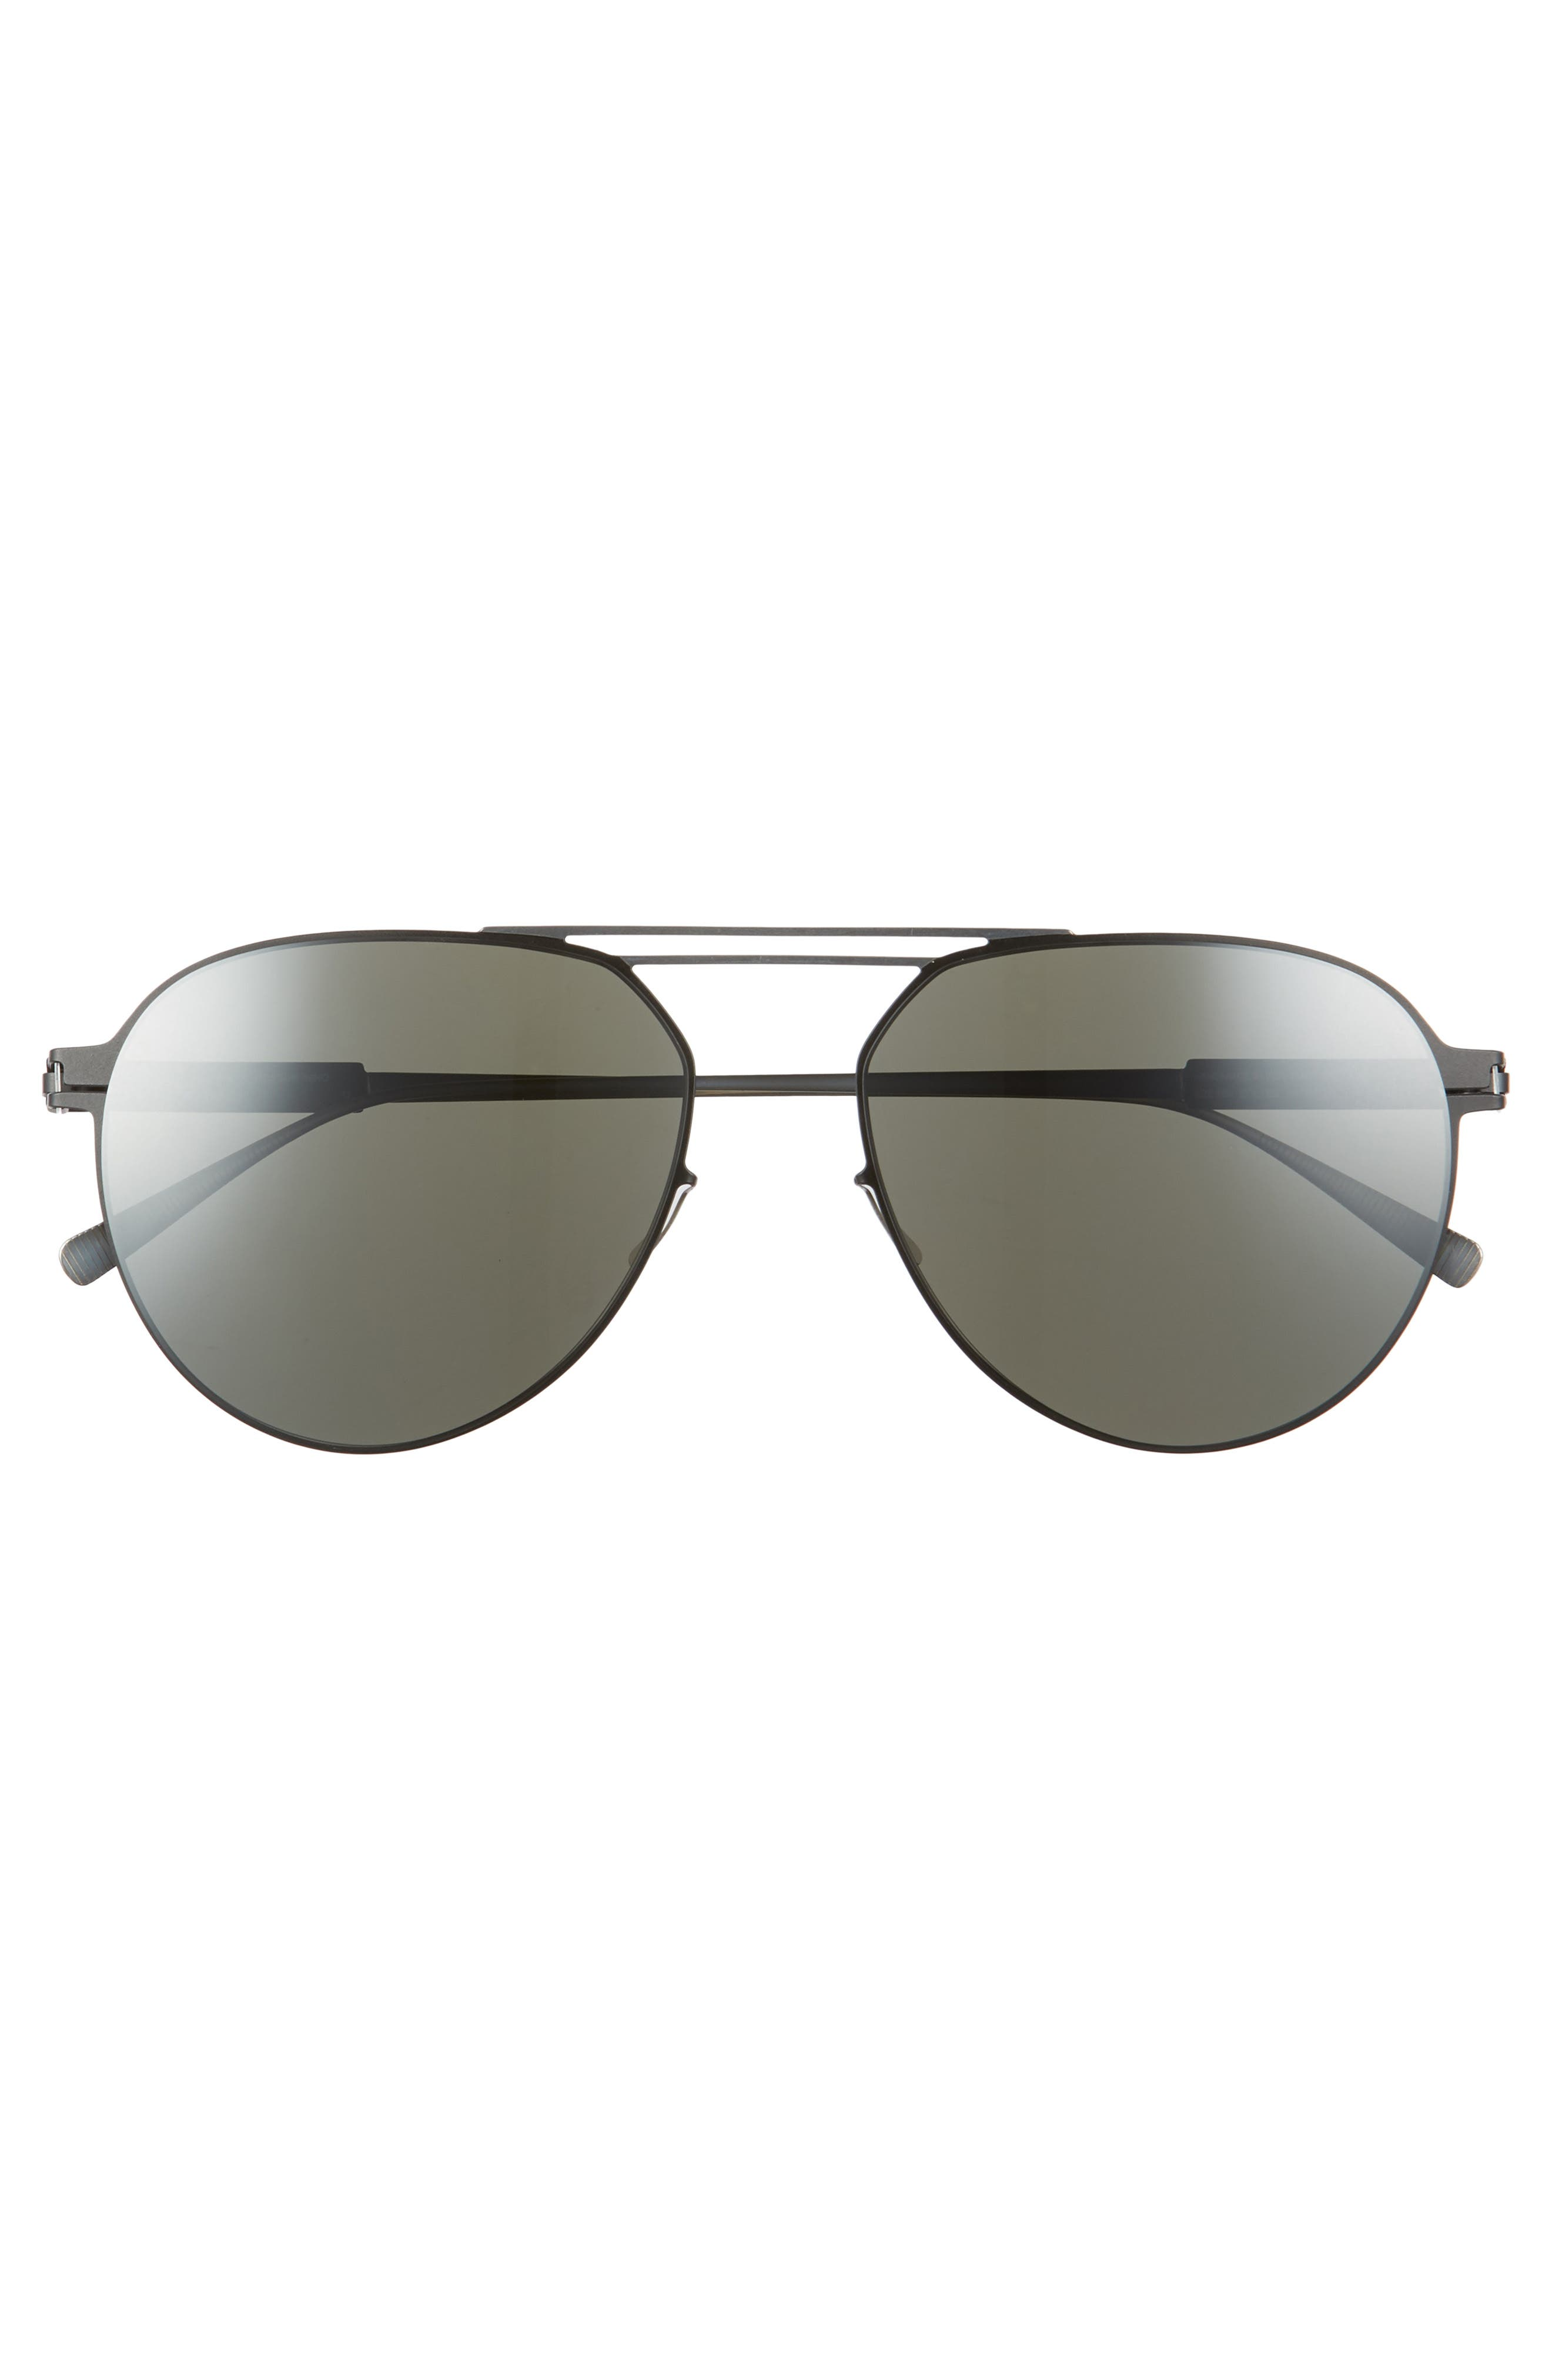 Nino 57mm Aviator Sunglasses,                             Alternate thumbnail 2, color,                             Silver/ Black